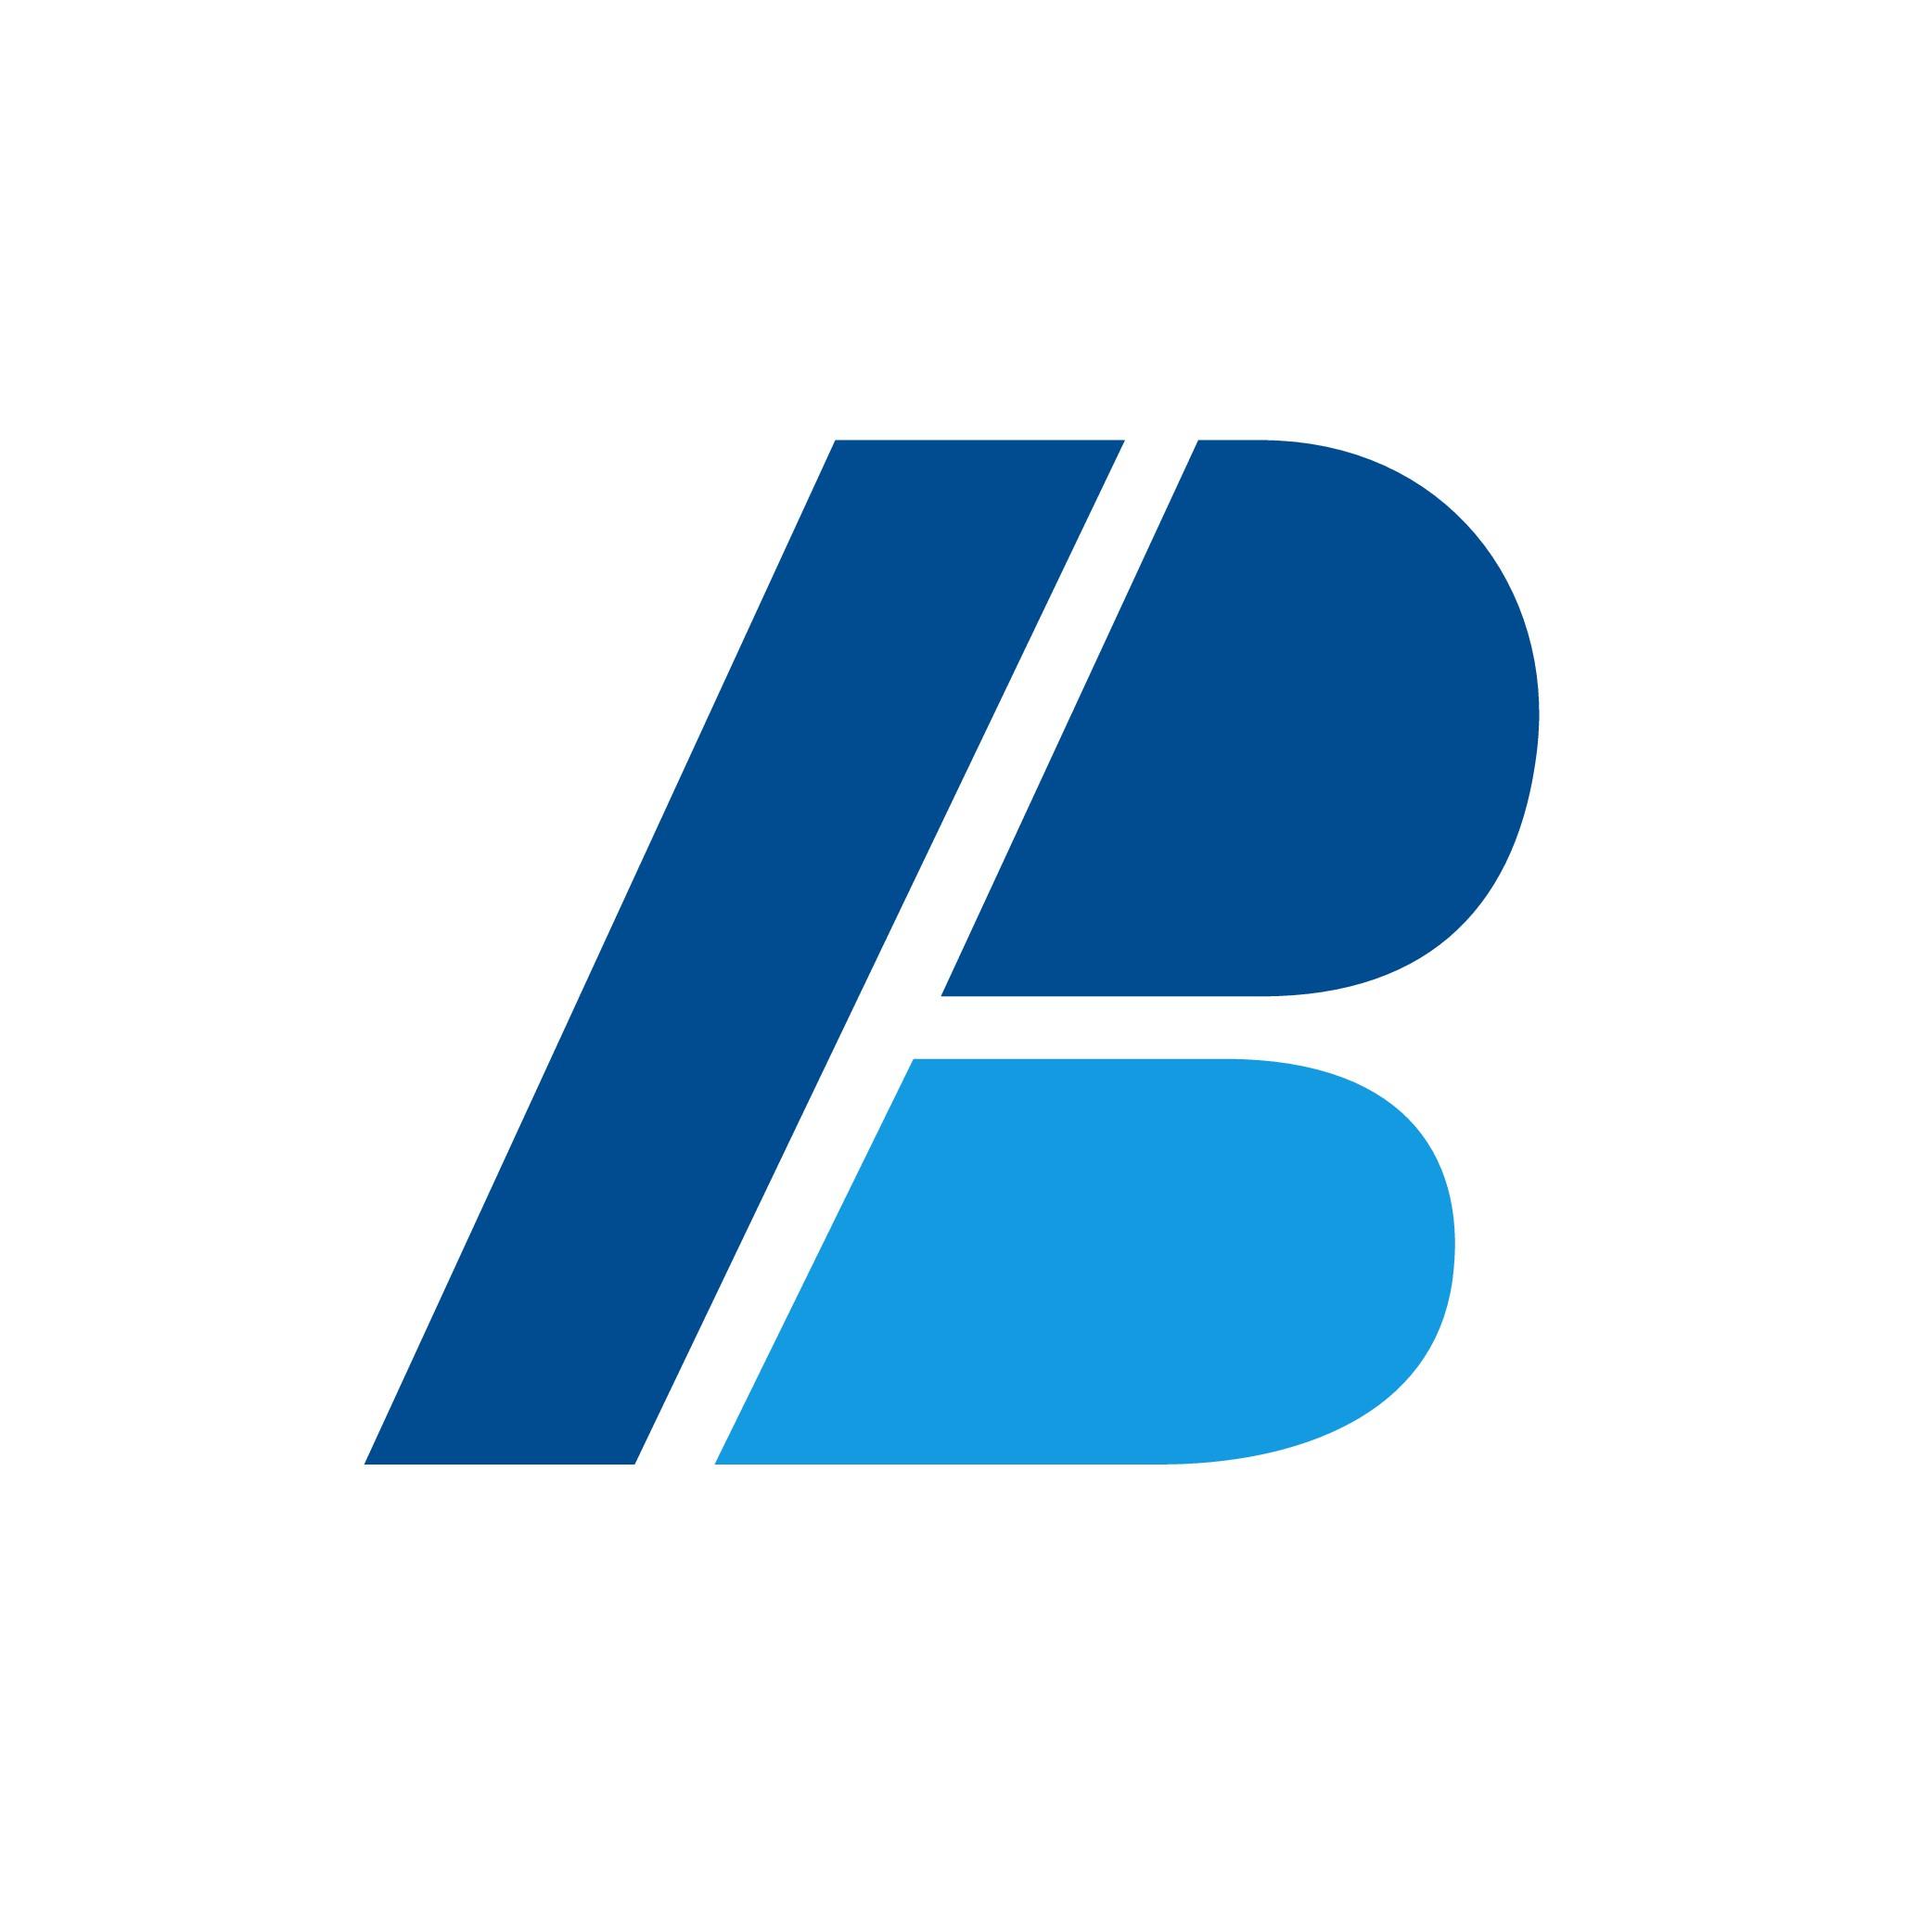 Design logo for the future of FinTech